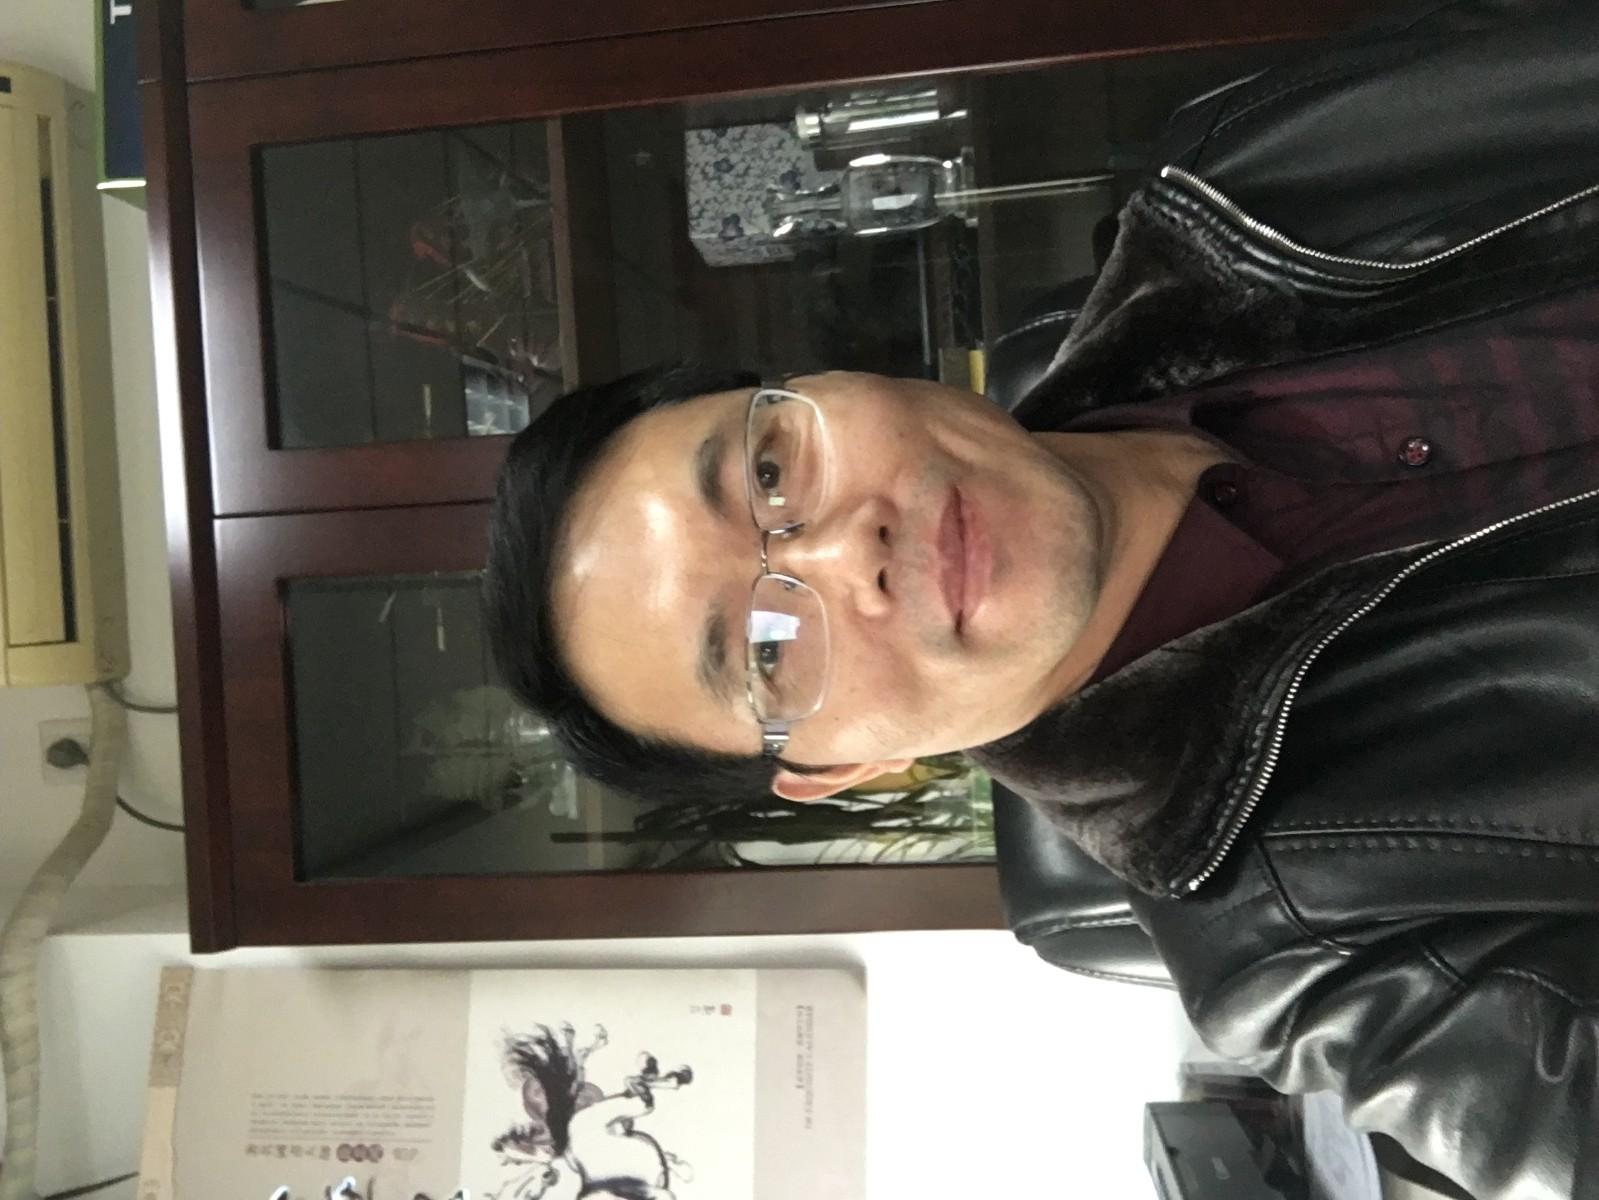 SHANGHAI HANCHENG INTERNATIONAL TRADING CO., LTD.